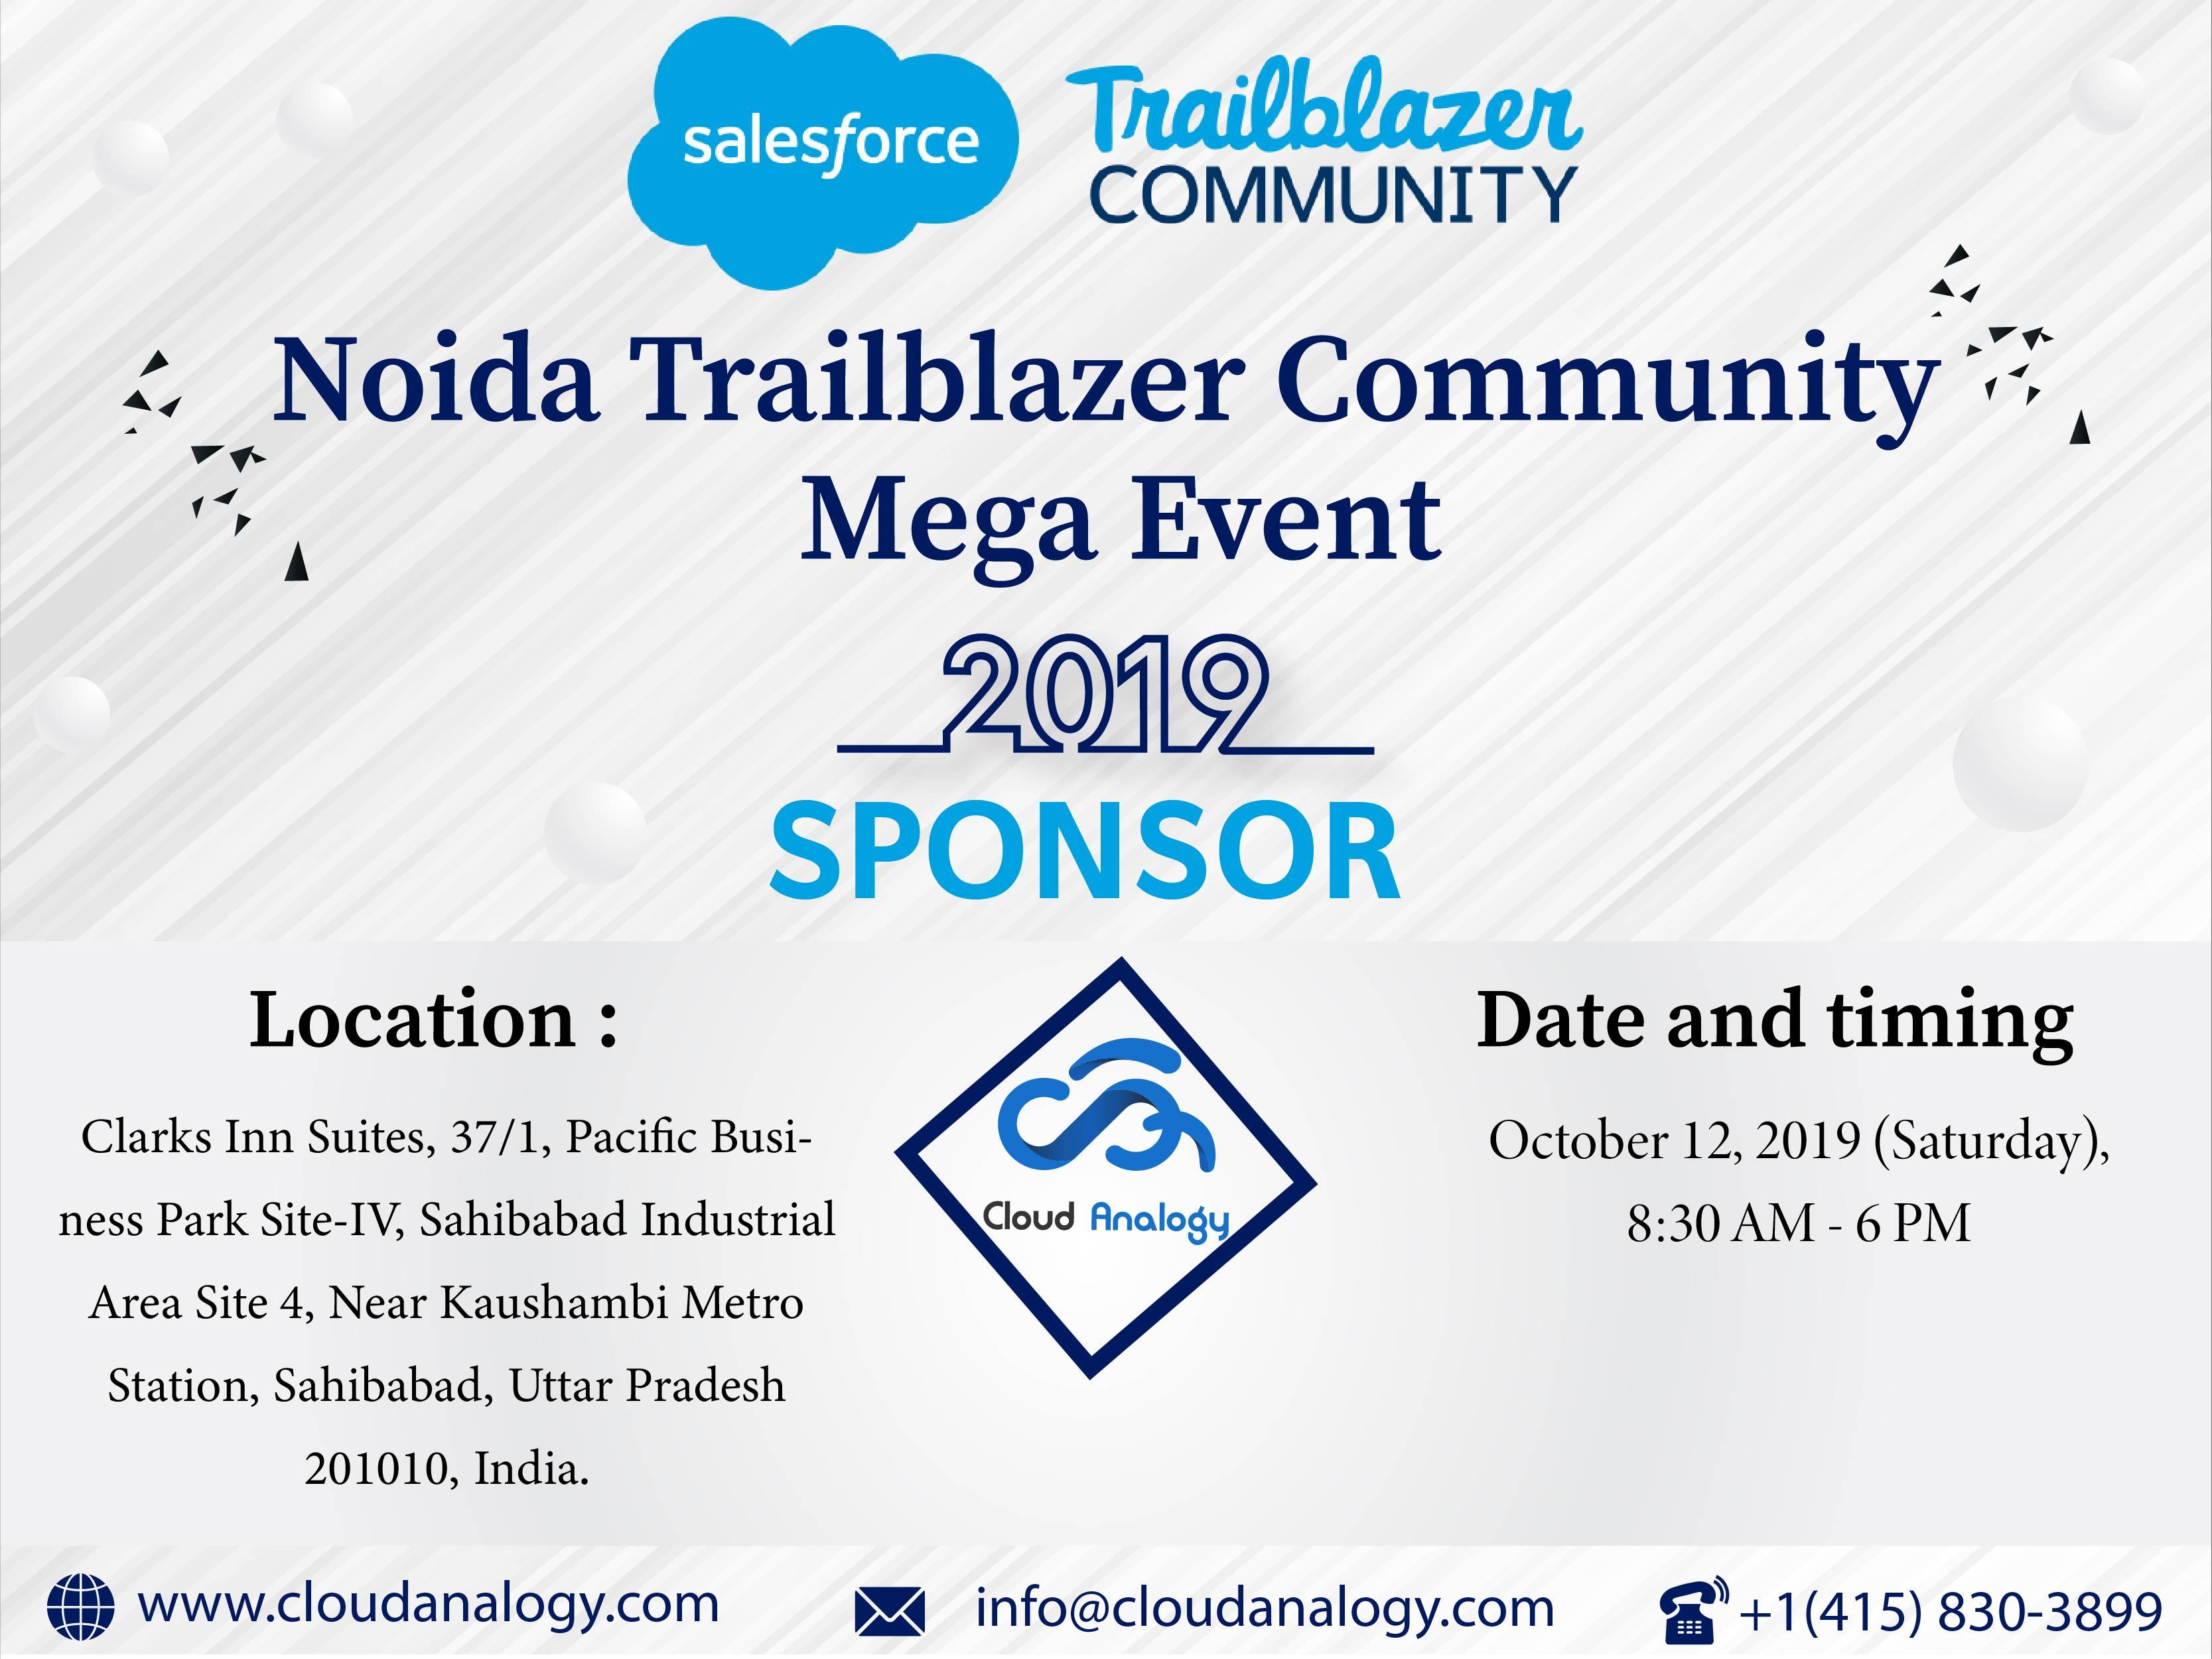 Cloud Analogy Sponsoring Noida Trailblazer Community Mega Event 2019